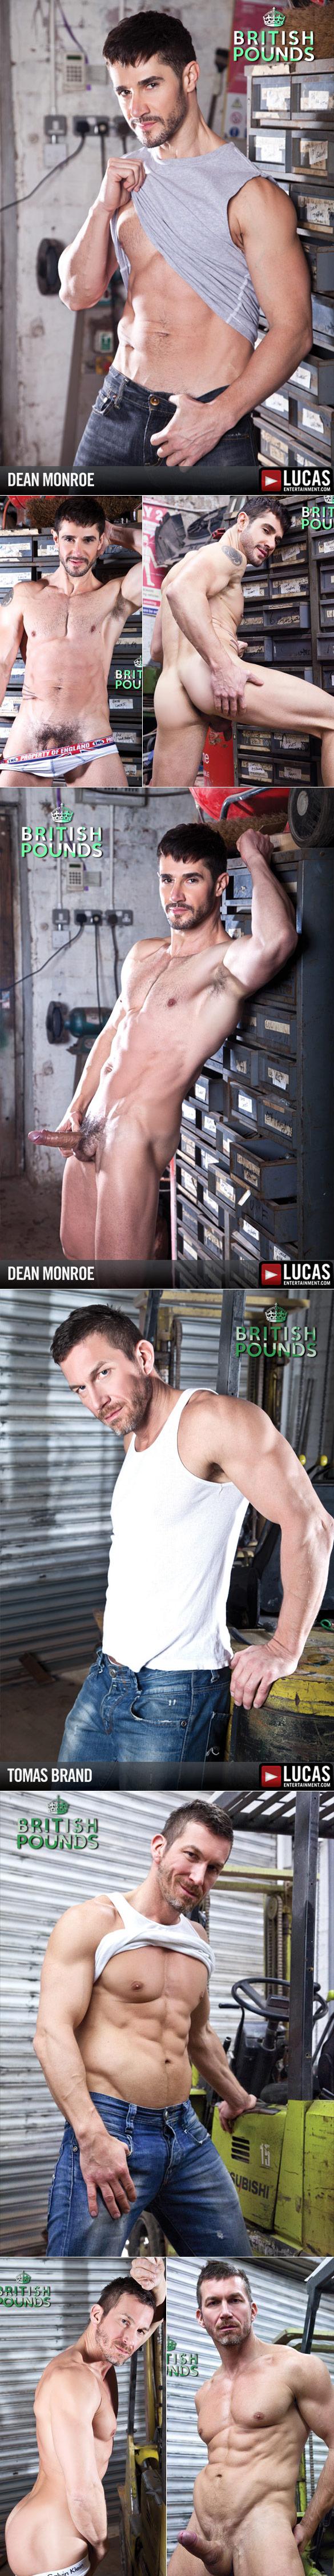 "LucasEntertainment: Dean Monroe bottoms for Tomas Brand in ""British Pounds"""